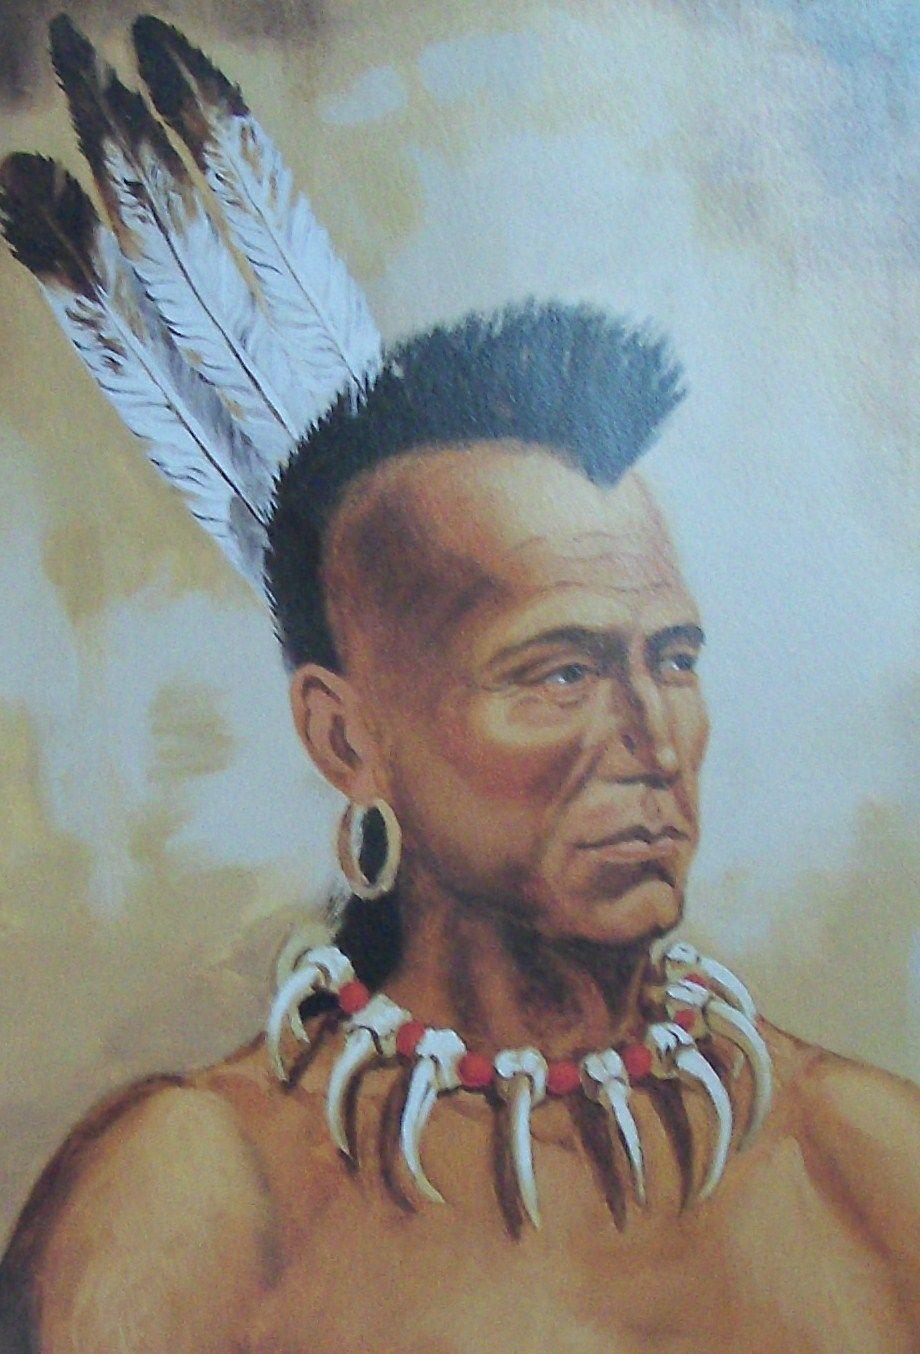 Mohawk Tribal Hairstyles Mohawk Hair Trend 2017